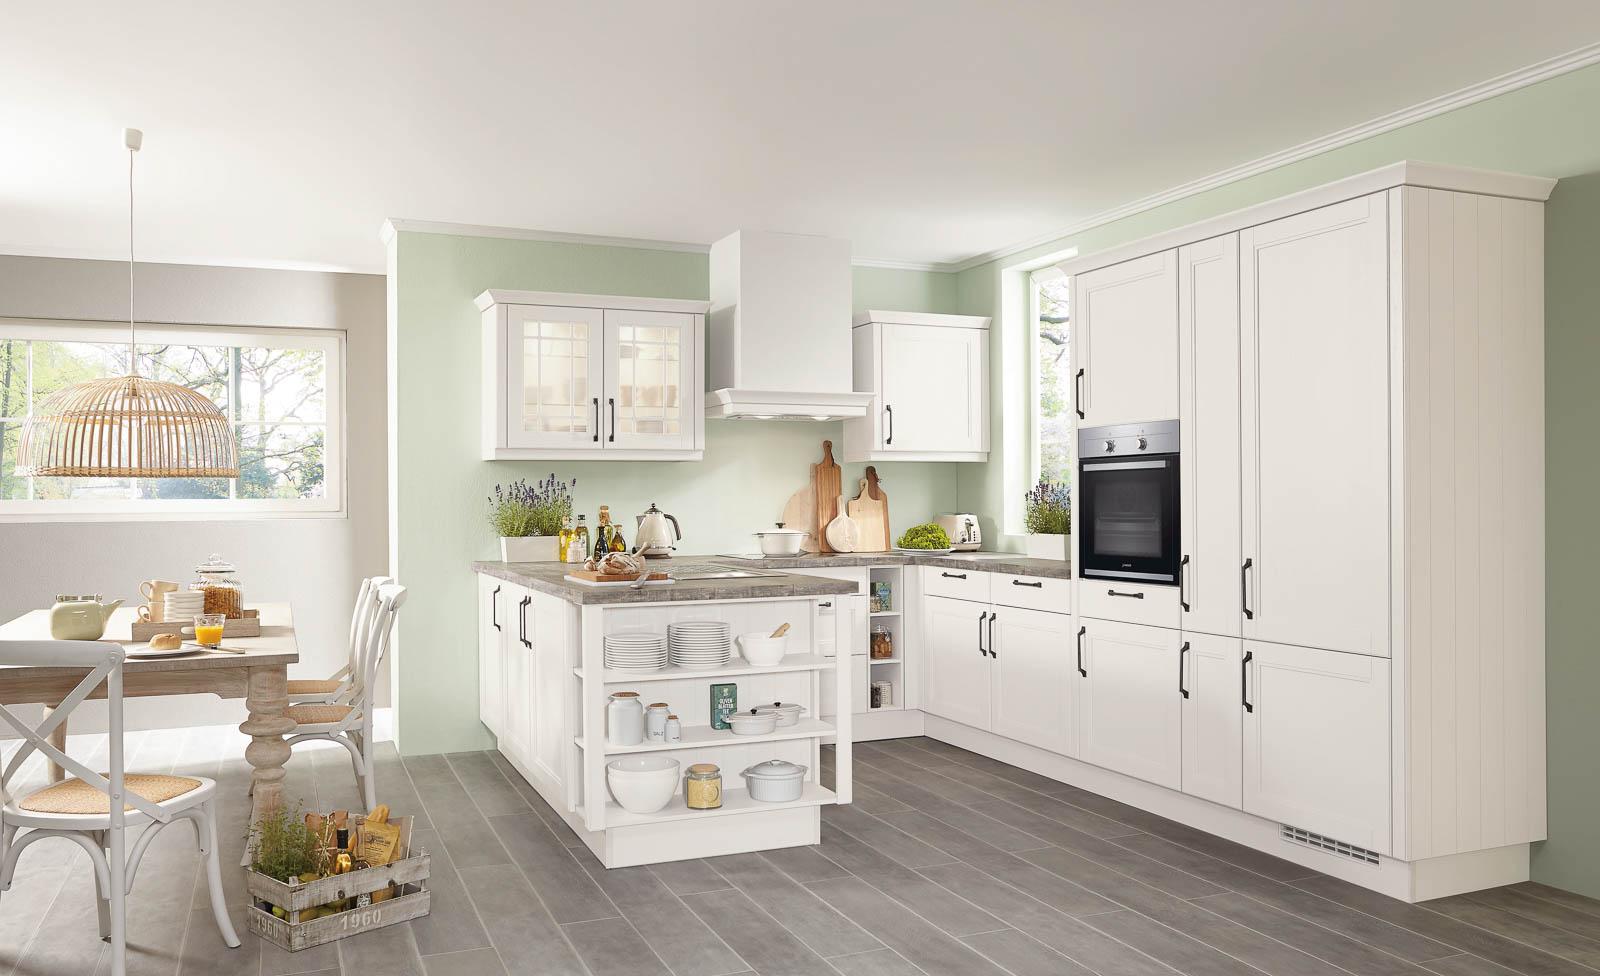 Nobilia Küchen - Modell York - 901